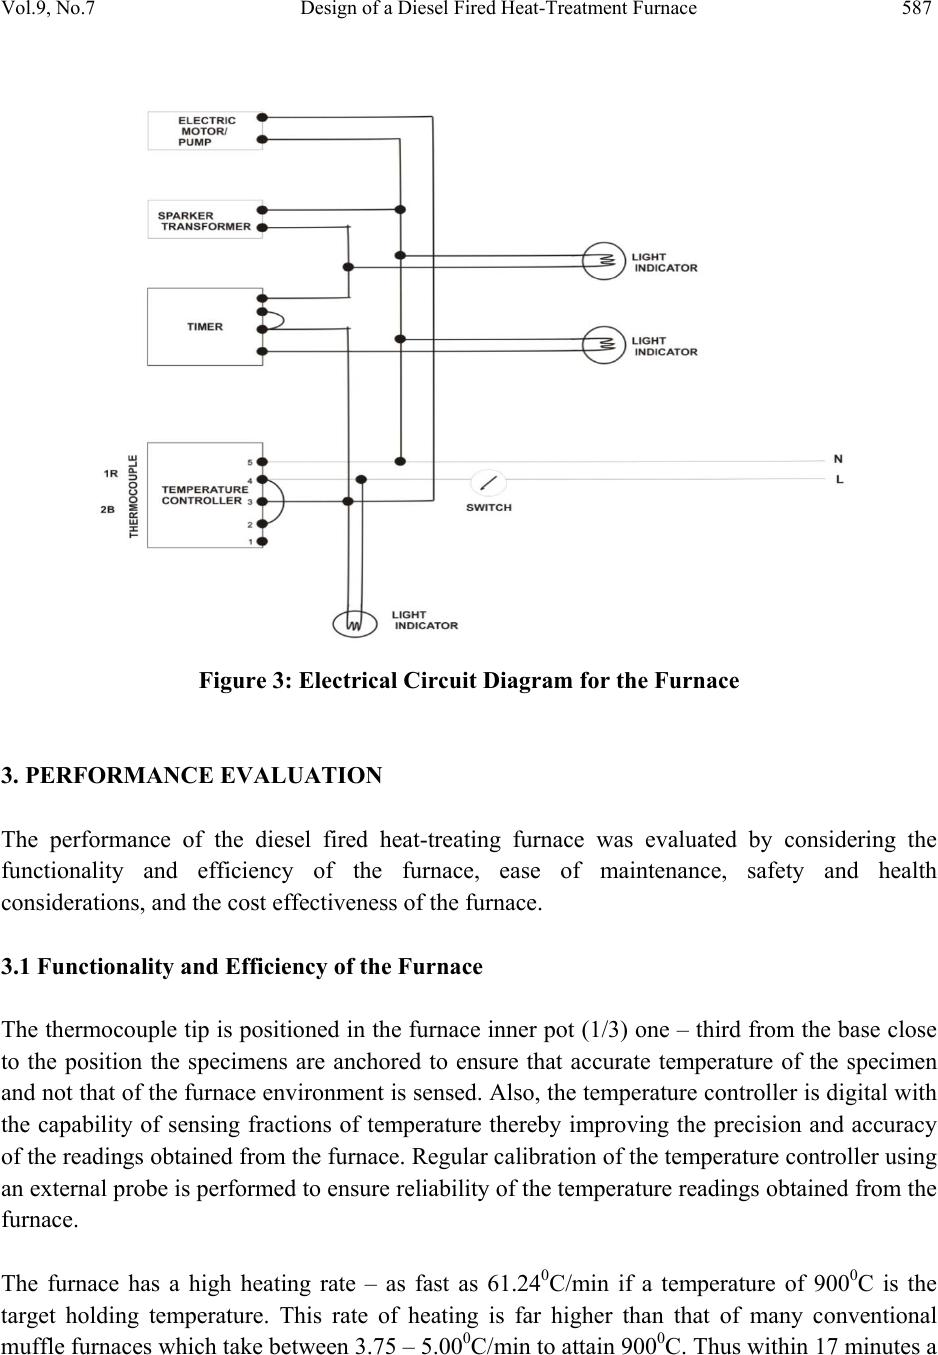 Design Of A Diesel Fired Heat Treatment Furnace Light Circuit Wiring Diagram Uk Vol9 No7 587